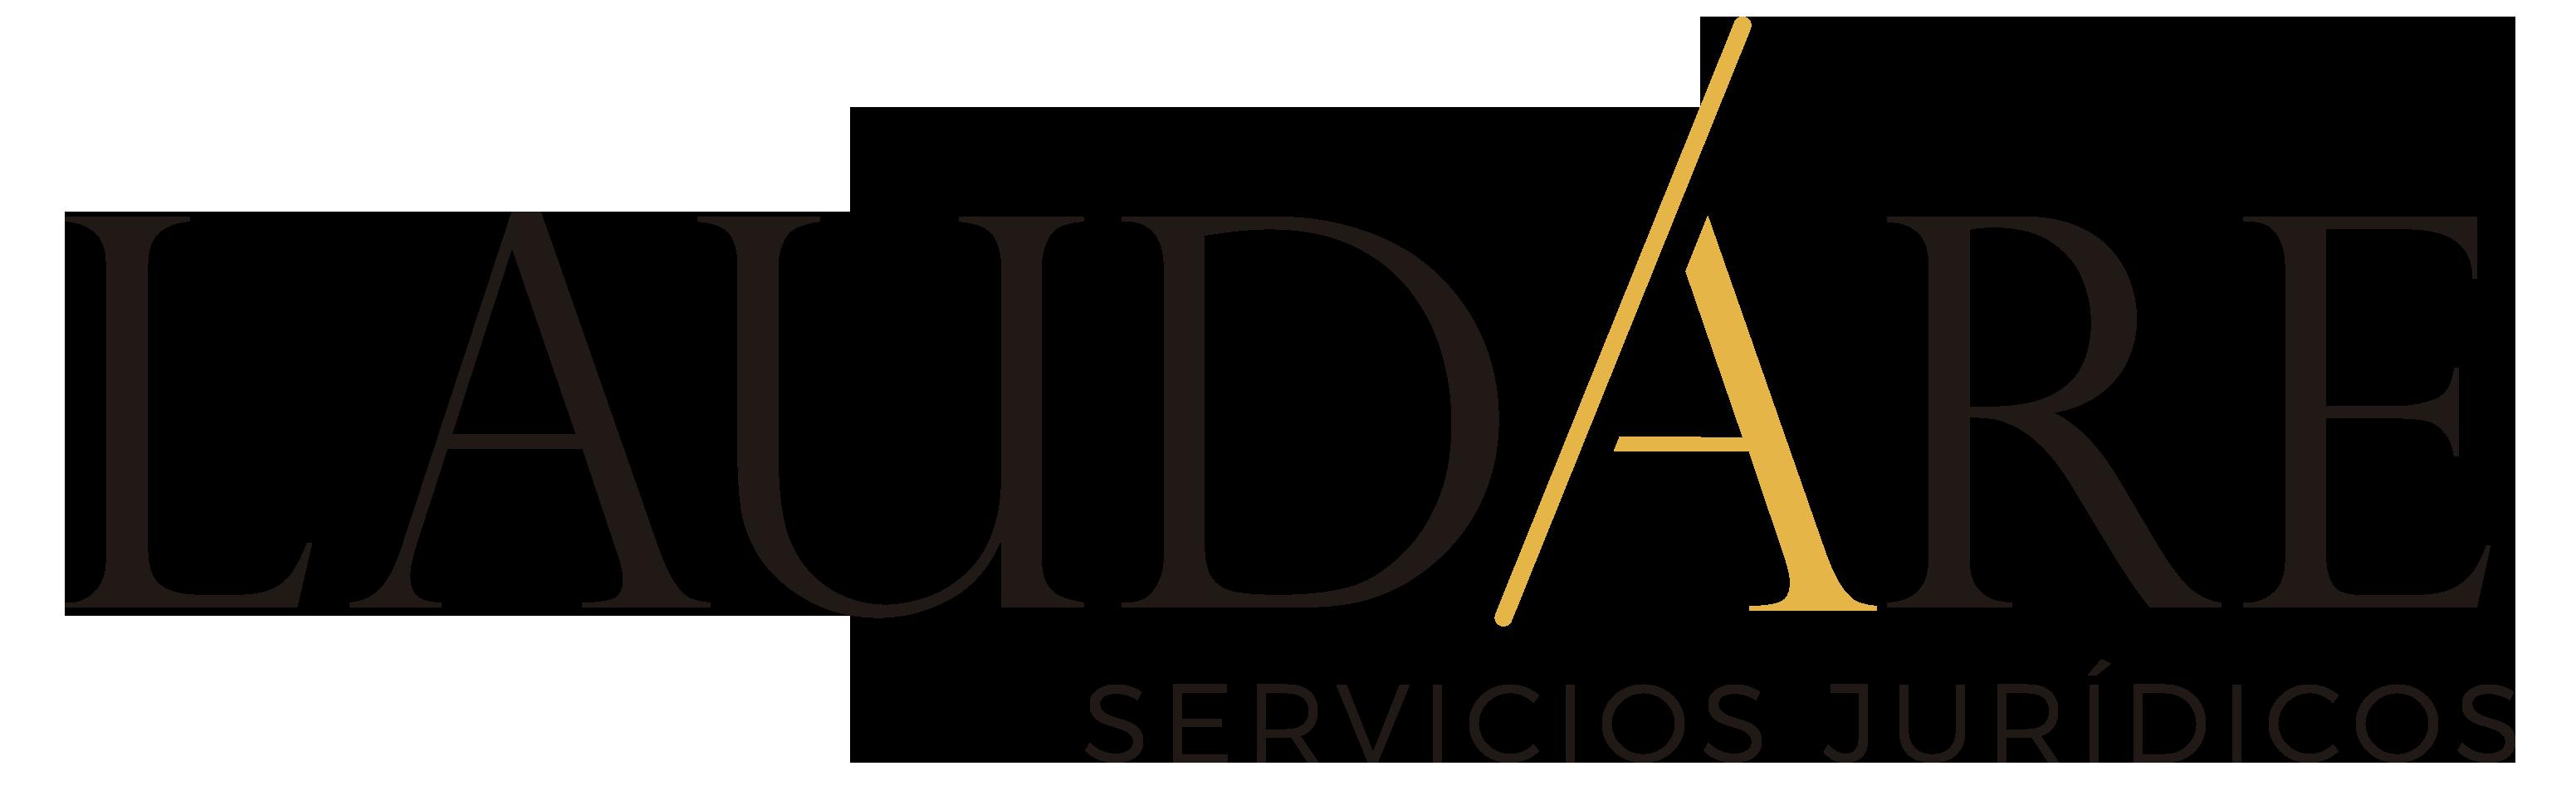 Laudare Servicios Jurdicos